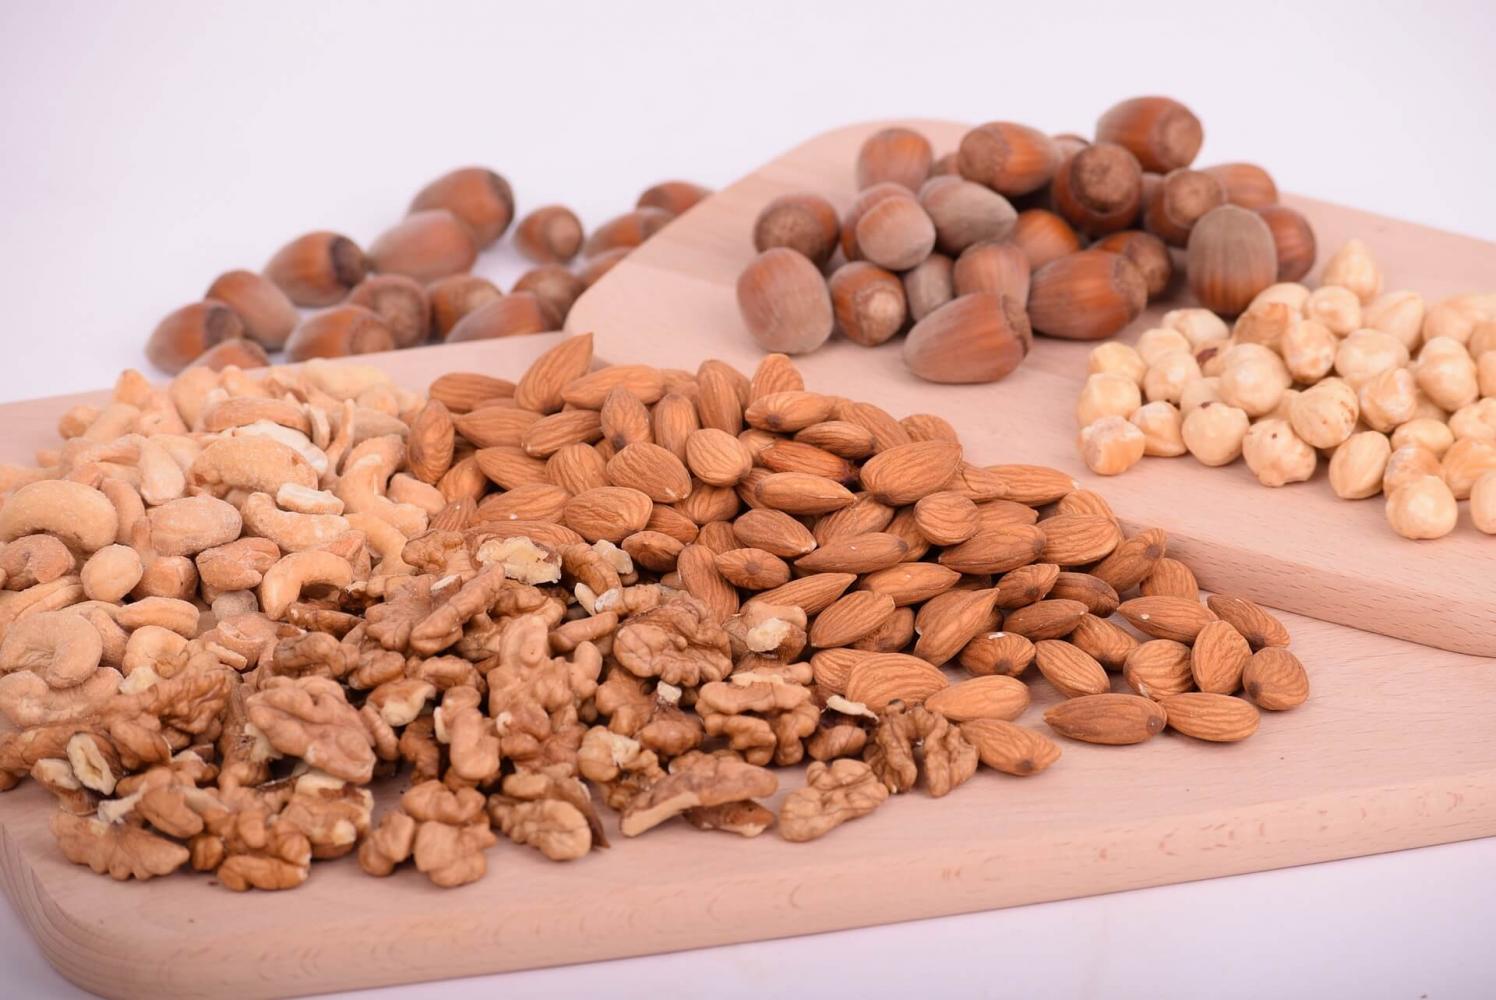 Nüsse als Proteinquelle